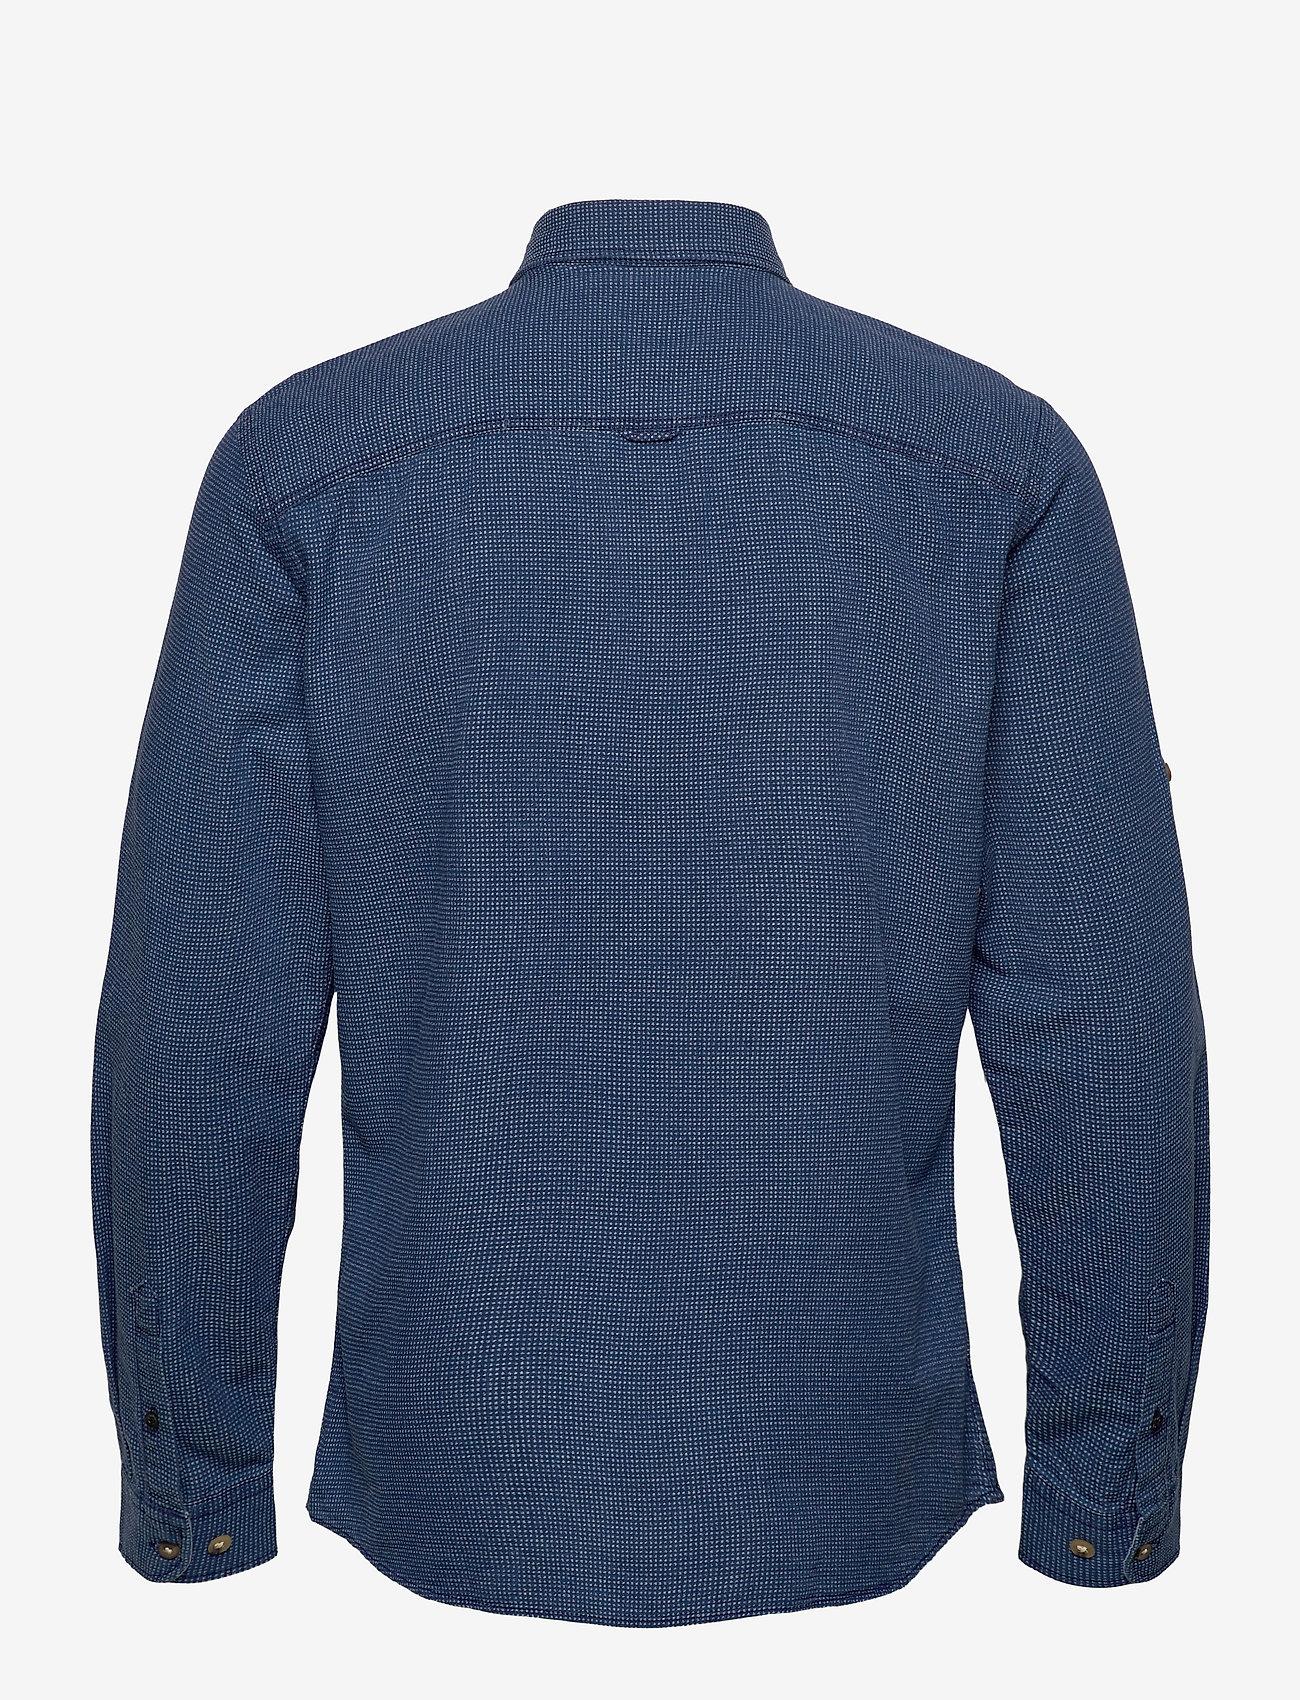 Jack & Jones - JPRBLUEASTON SHIRT L/S ONE POCKET - casual skjortor - denim blue - 1